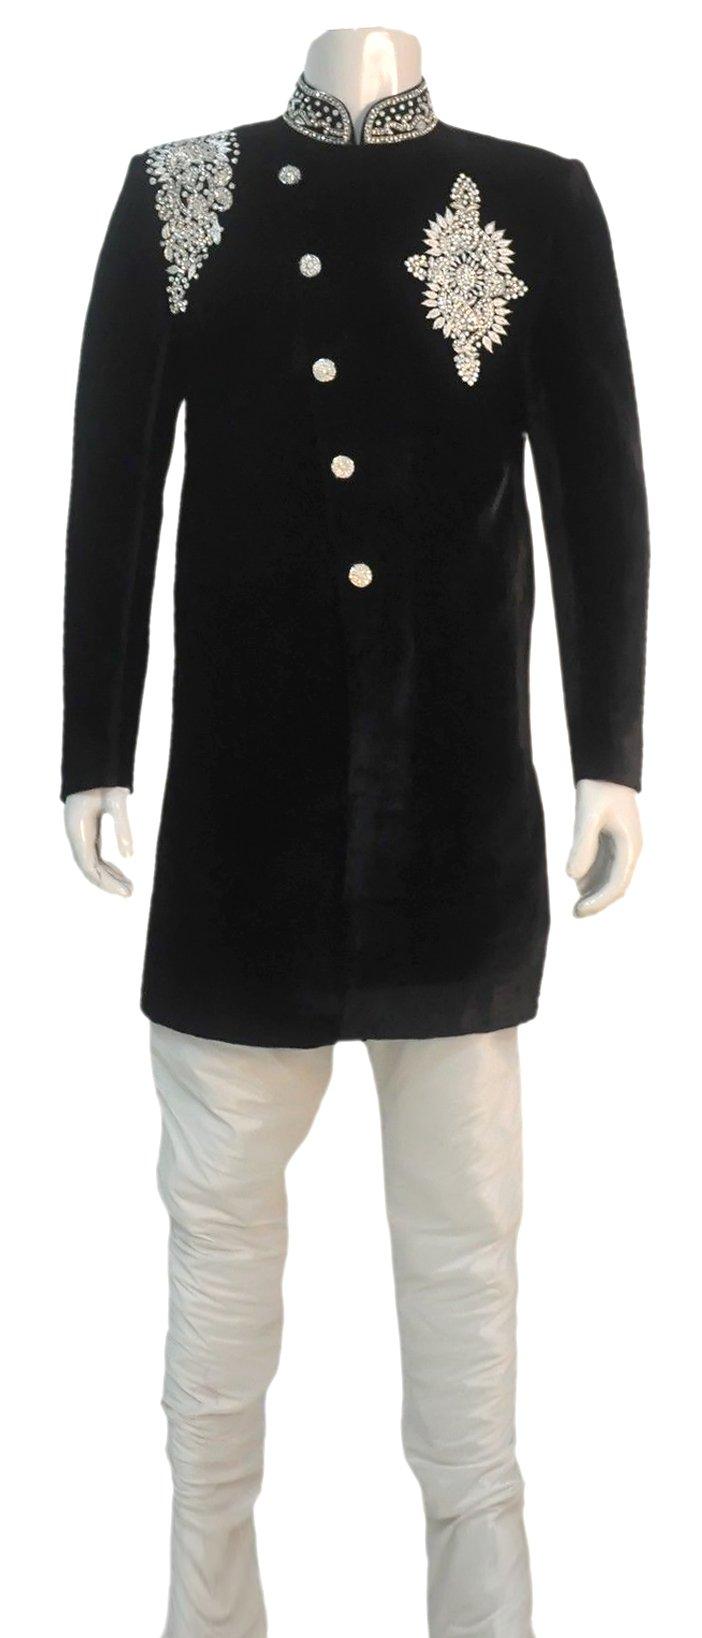 Rajwada Men's Indian Indo Western Sherwani 2pc Suit (Worldwide Post) (M (38), Black)